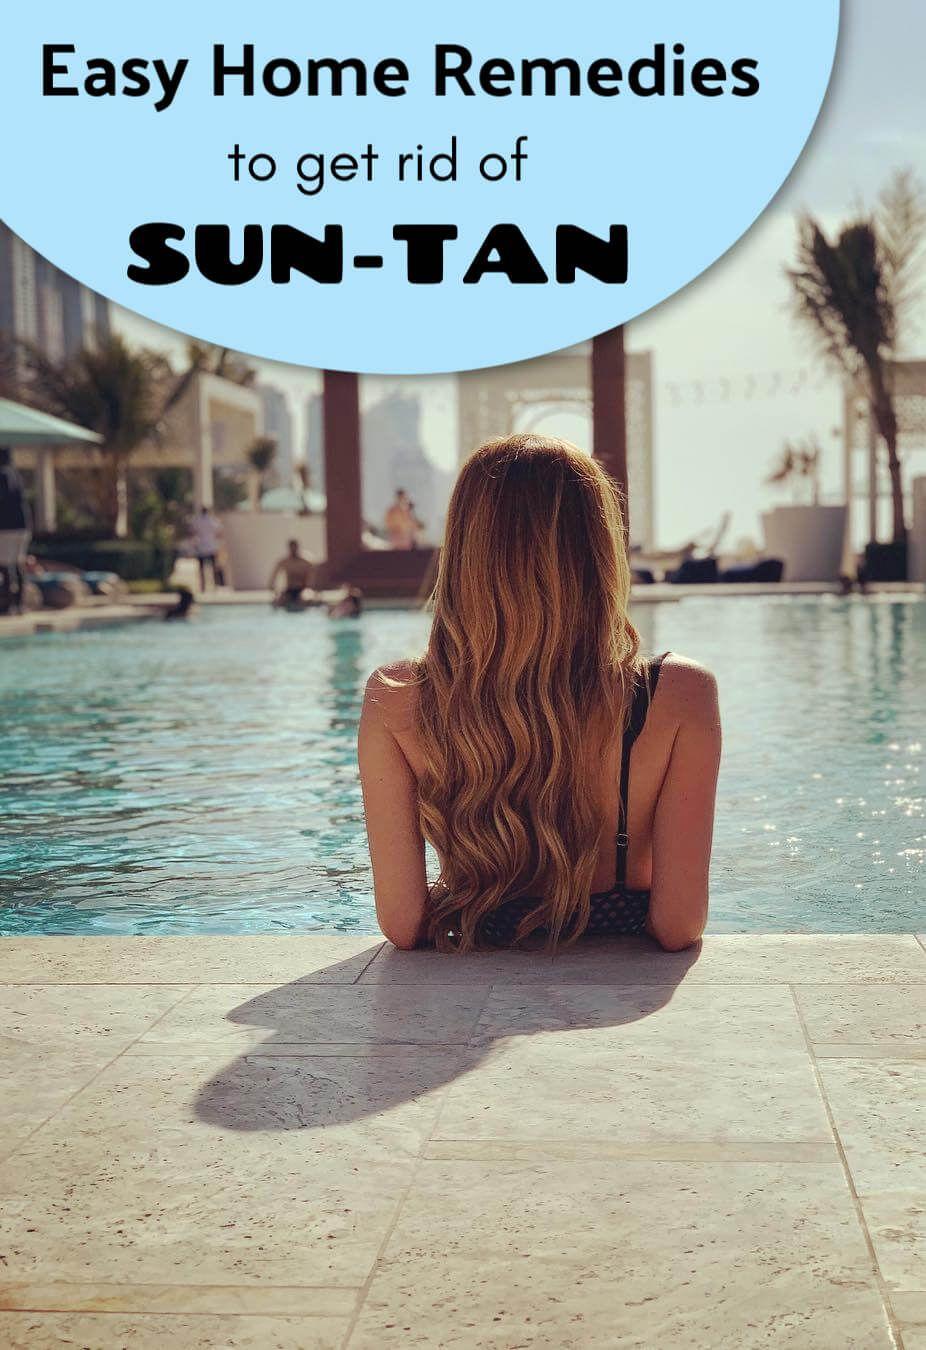 Home Remedies To Get Rid Of Tan Hair Growth Faster Get Rid Of Tan Sun Tan